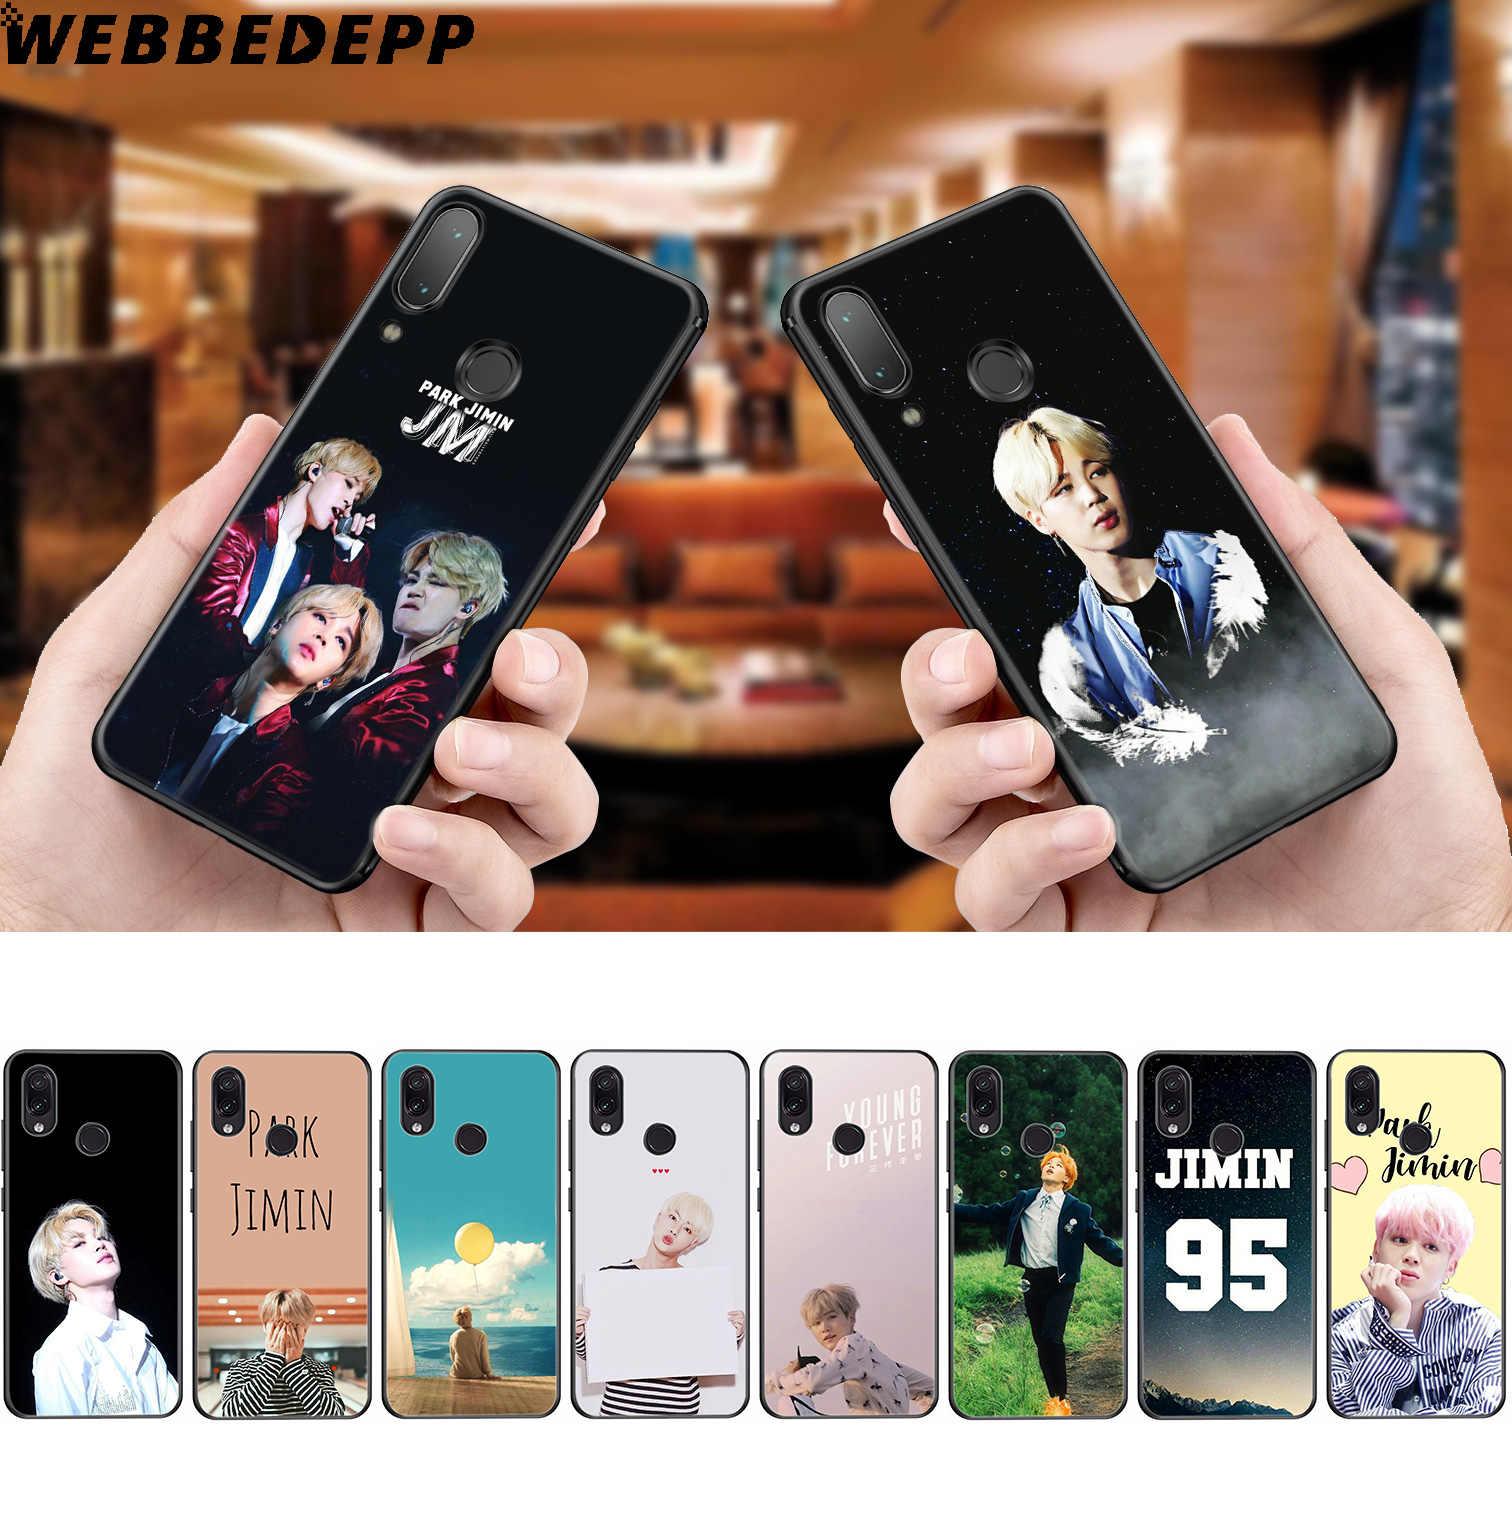 WEBBEDEPP парк Цзиминь K поп мягкий чехол для Xiaomi Redmi K20 7A 4A 4X5 5A 6 6A S2 Note 8 4 4X5 6 5A 7 Pro Plus Prime